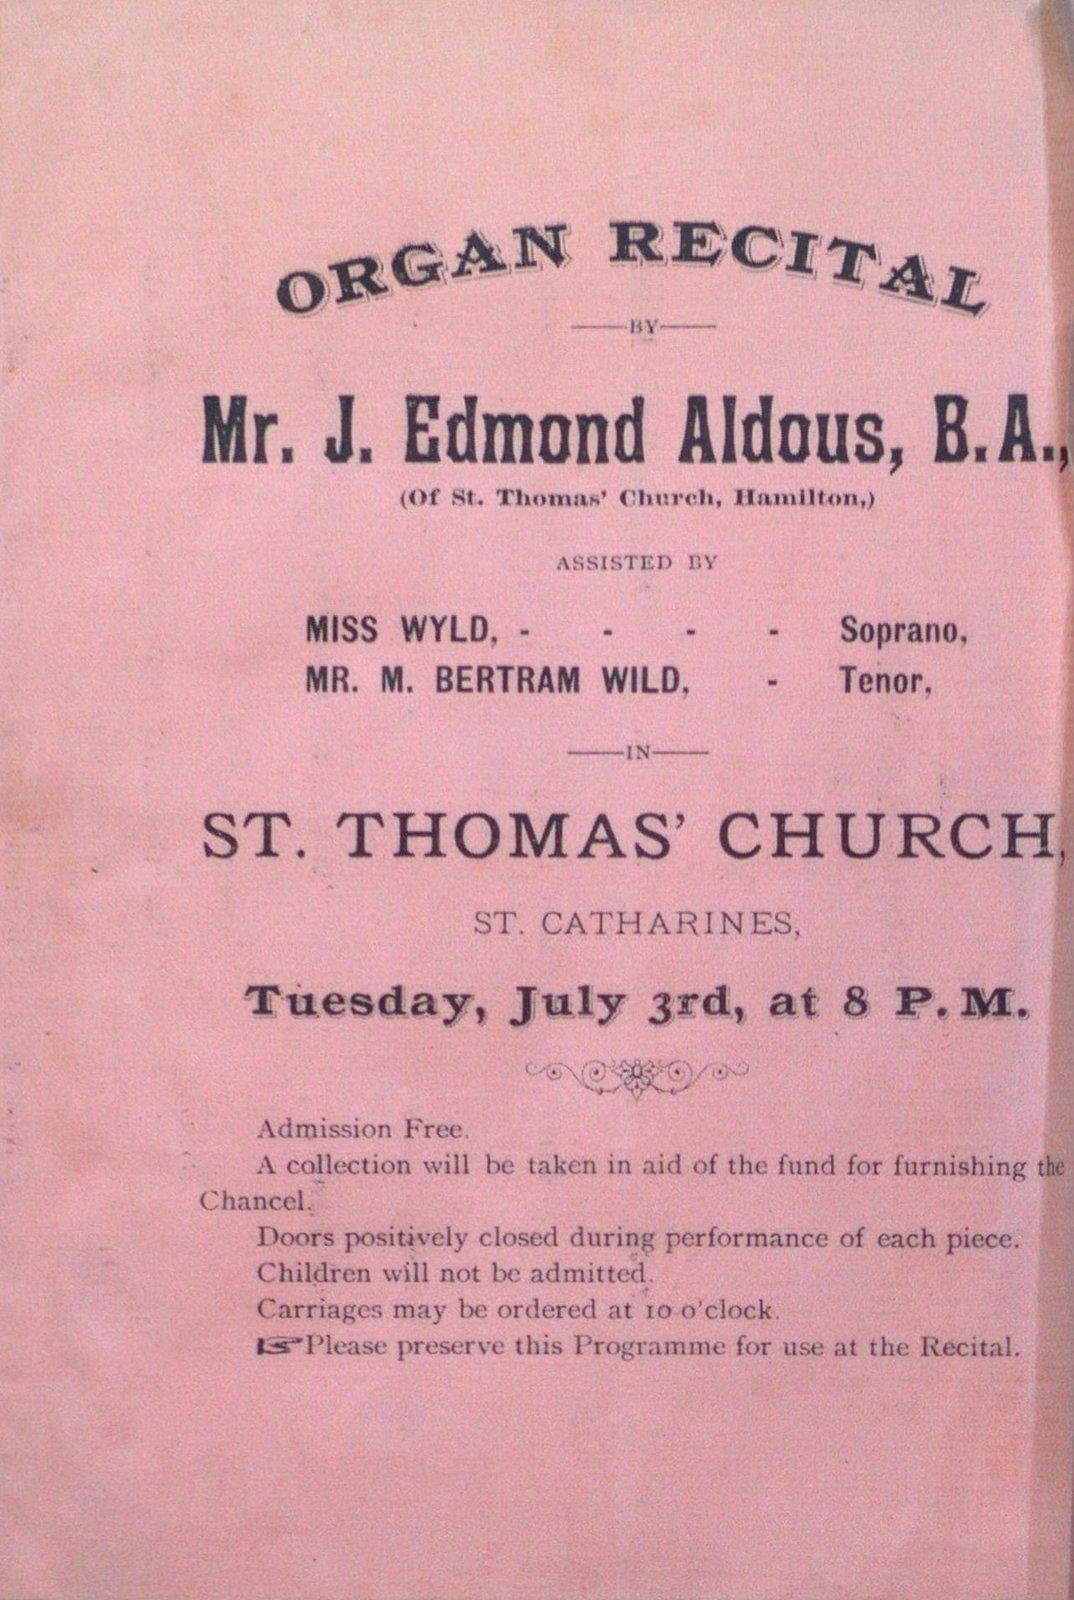 Teresa Vanderburgh's Musical Scrapbook #1 - Program for an Organ Recital given by Mr. J. Edmond Aldous